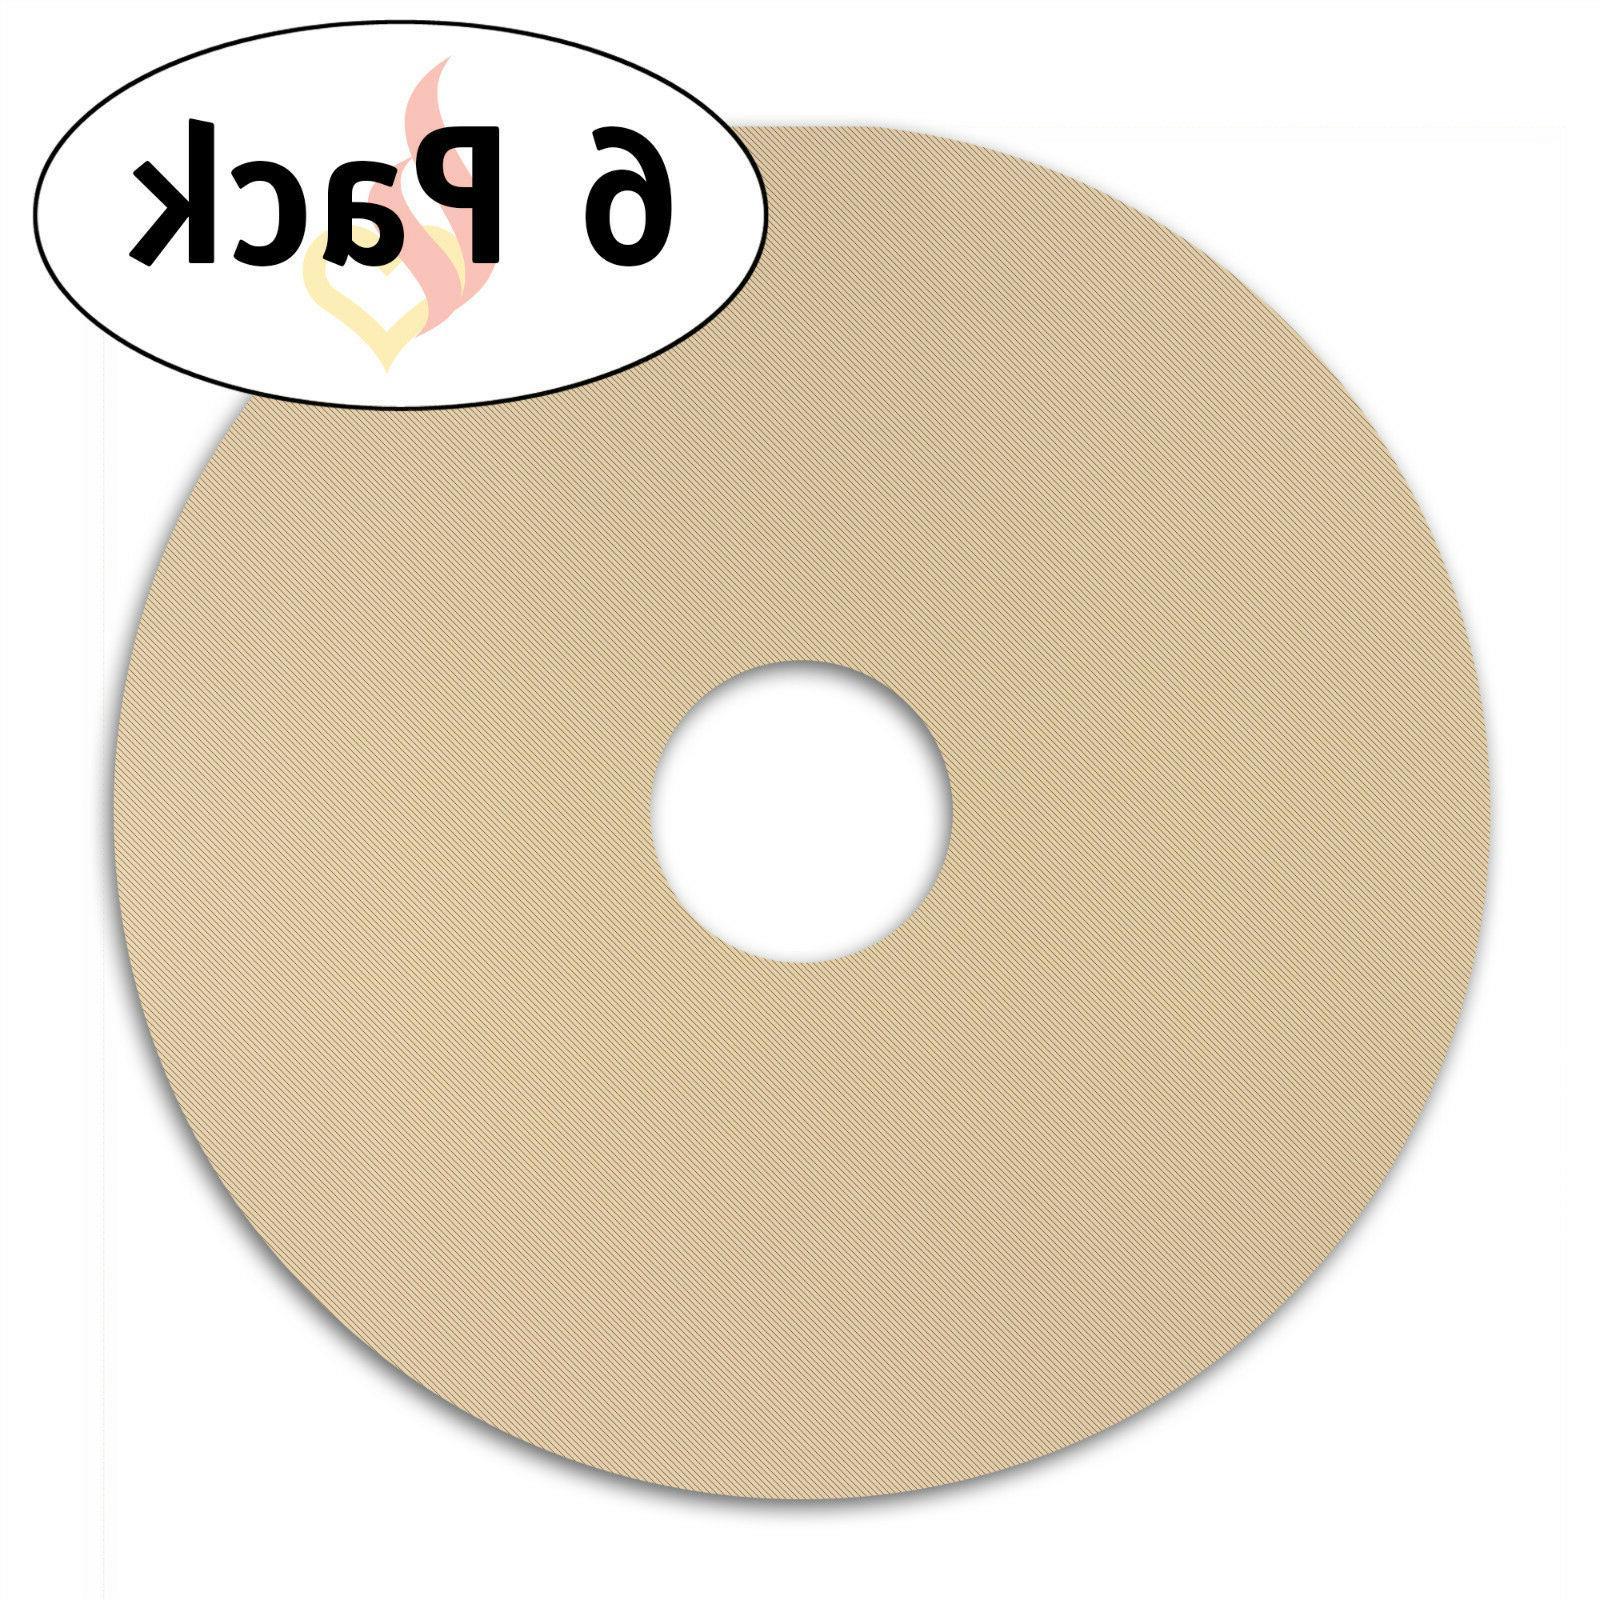 Homey Round Reusable Stick Teflon Food Dehydrator x 12.5-Inches